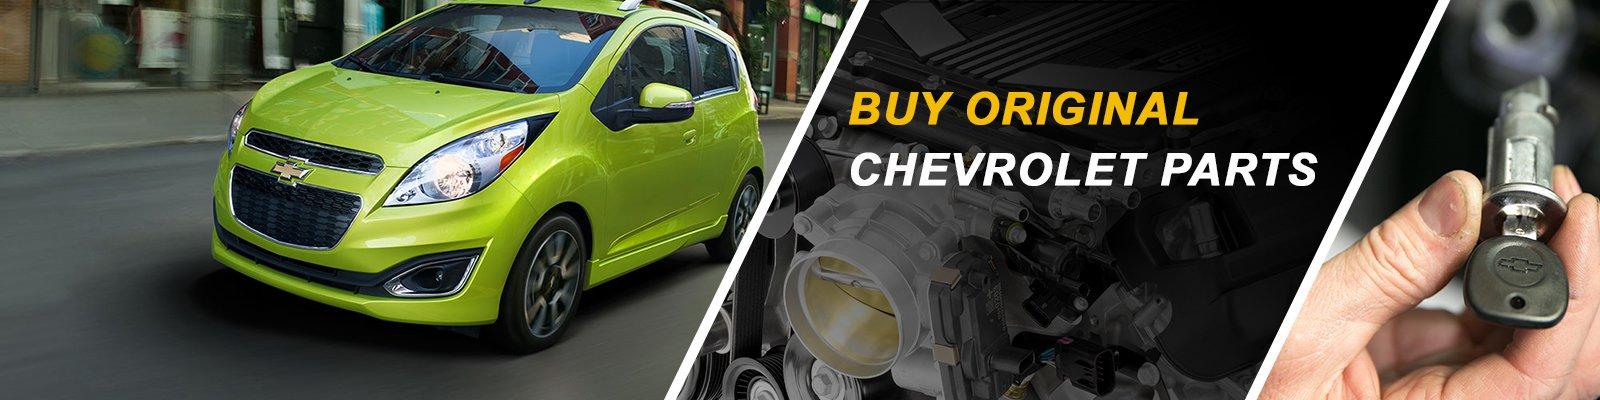 GM OEM Parts & Accessories | Genuine Parts at Discount Prices ...